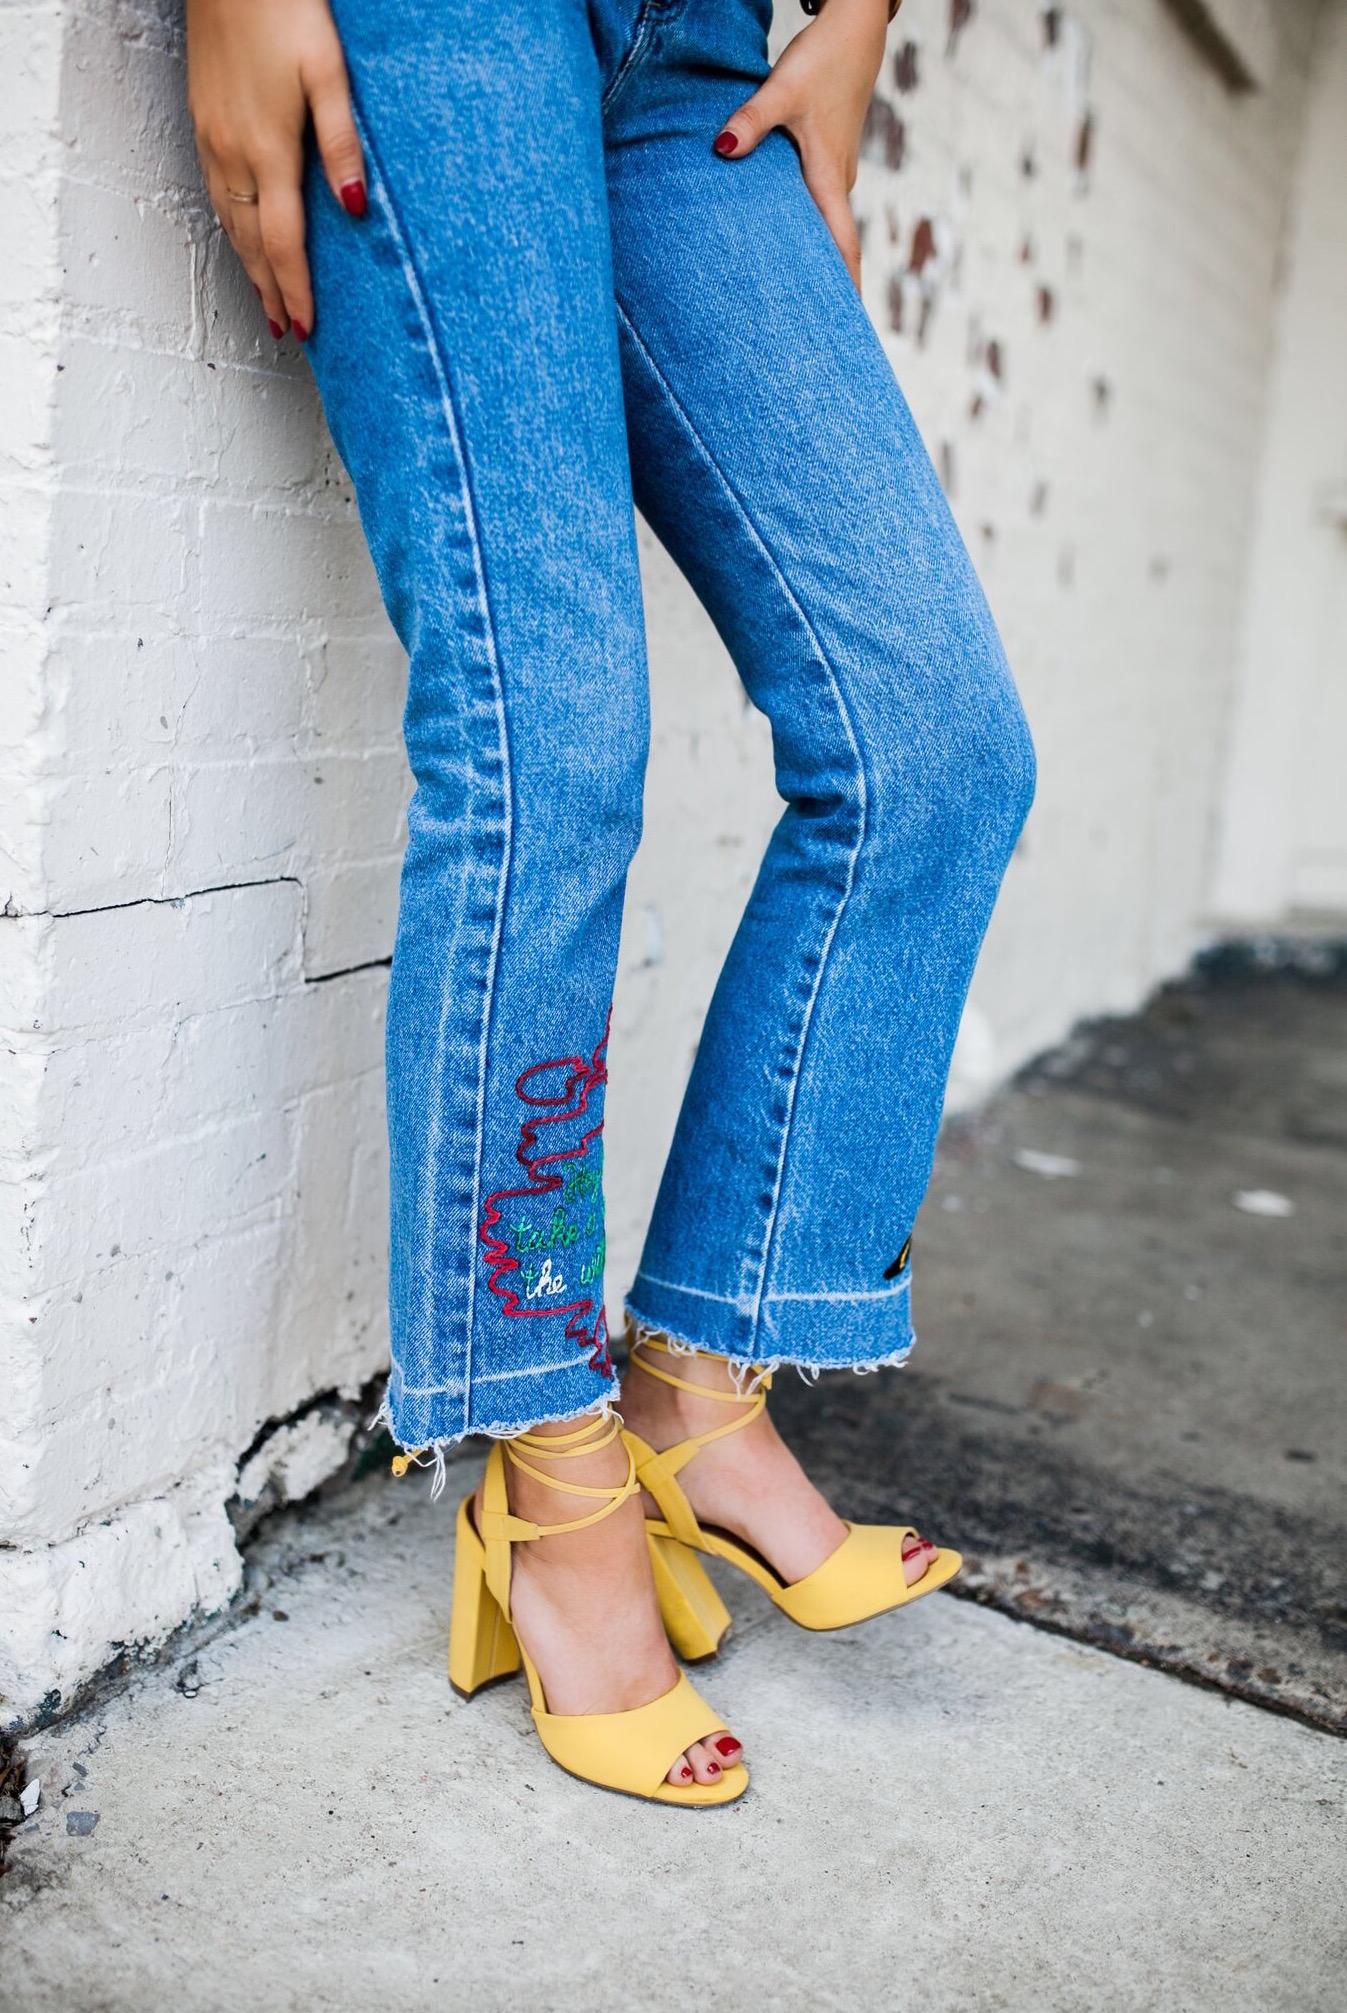 yellow-steve-madden-heels.JPG